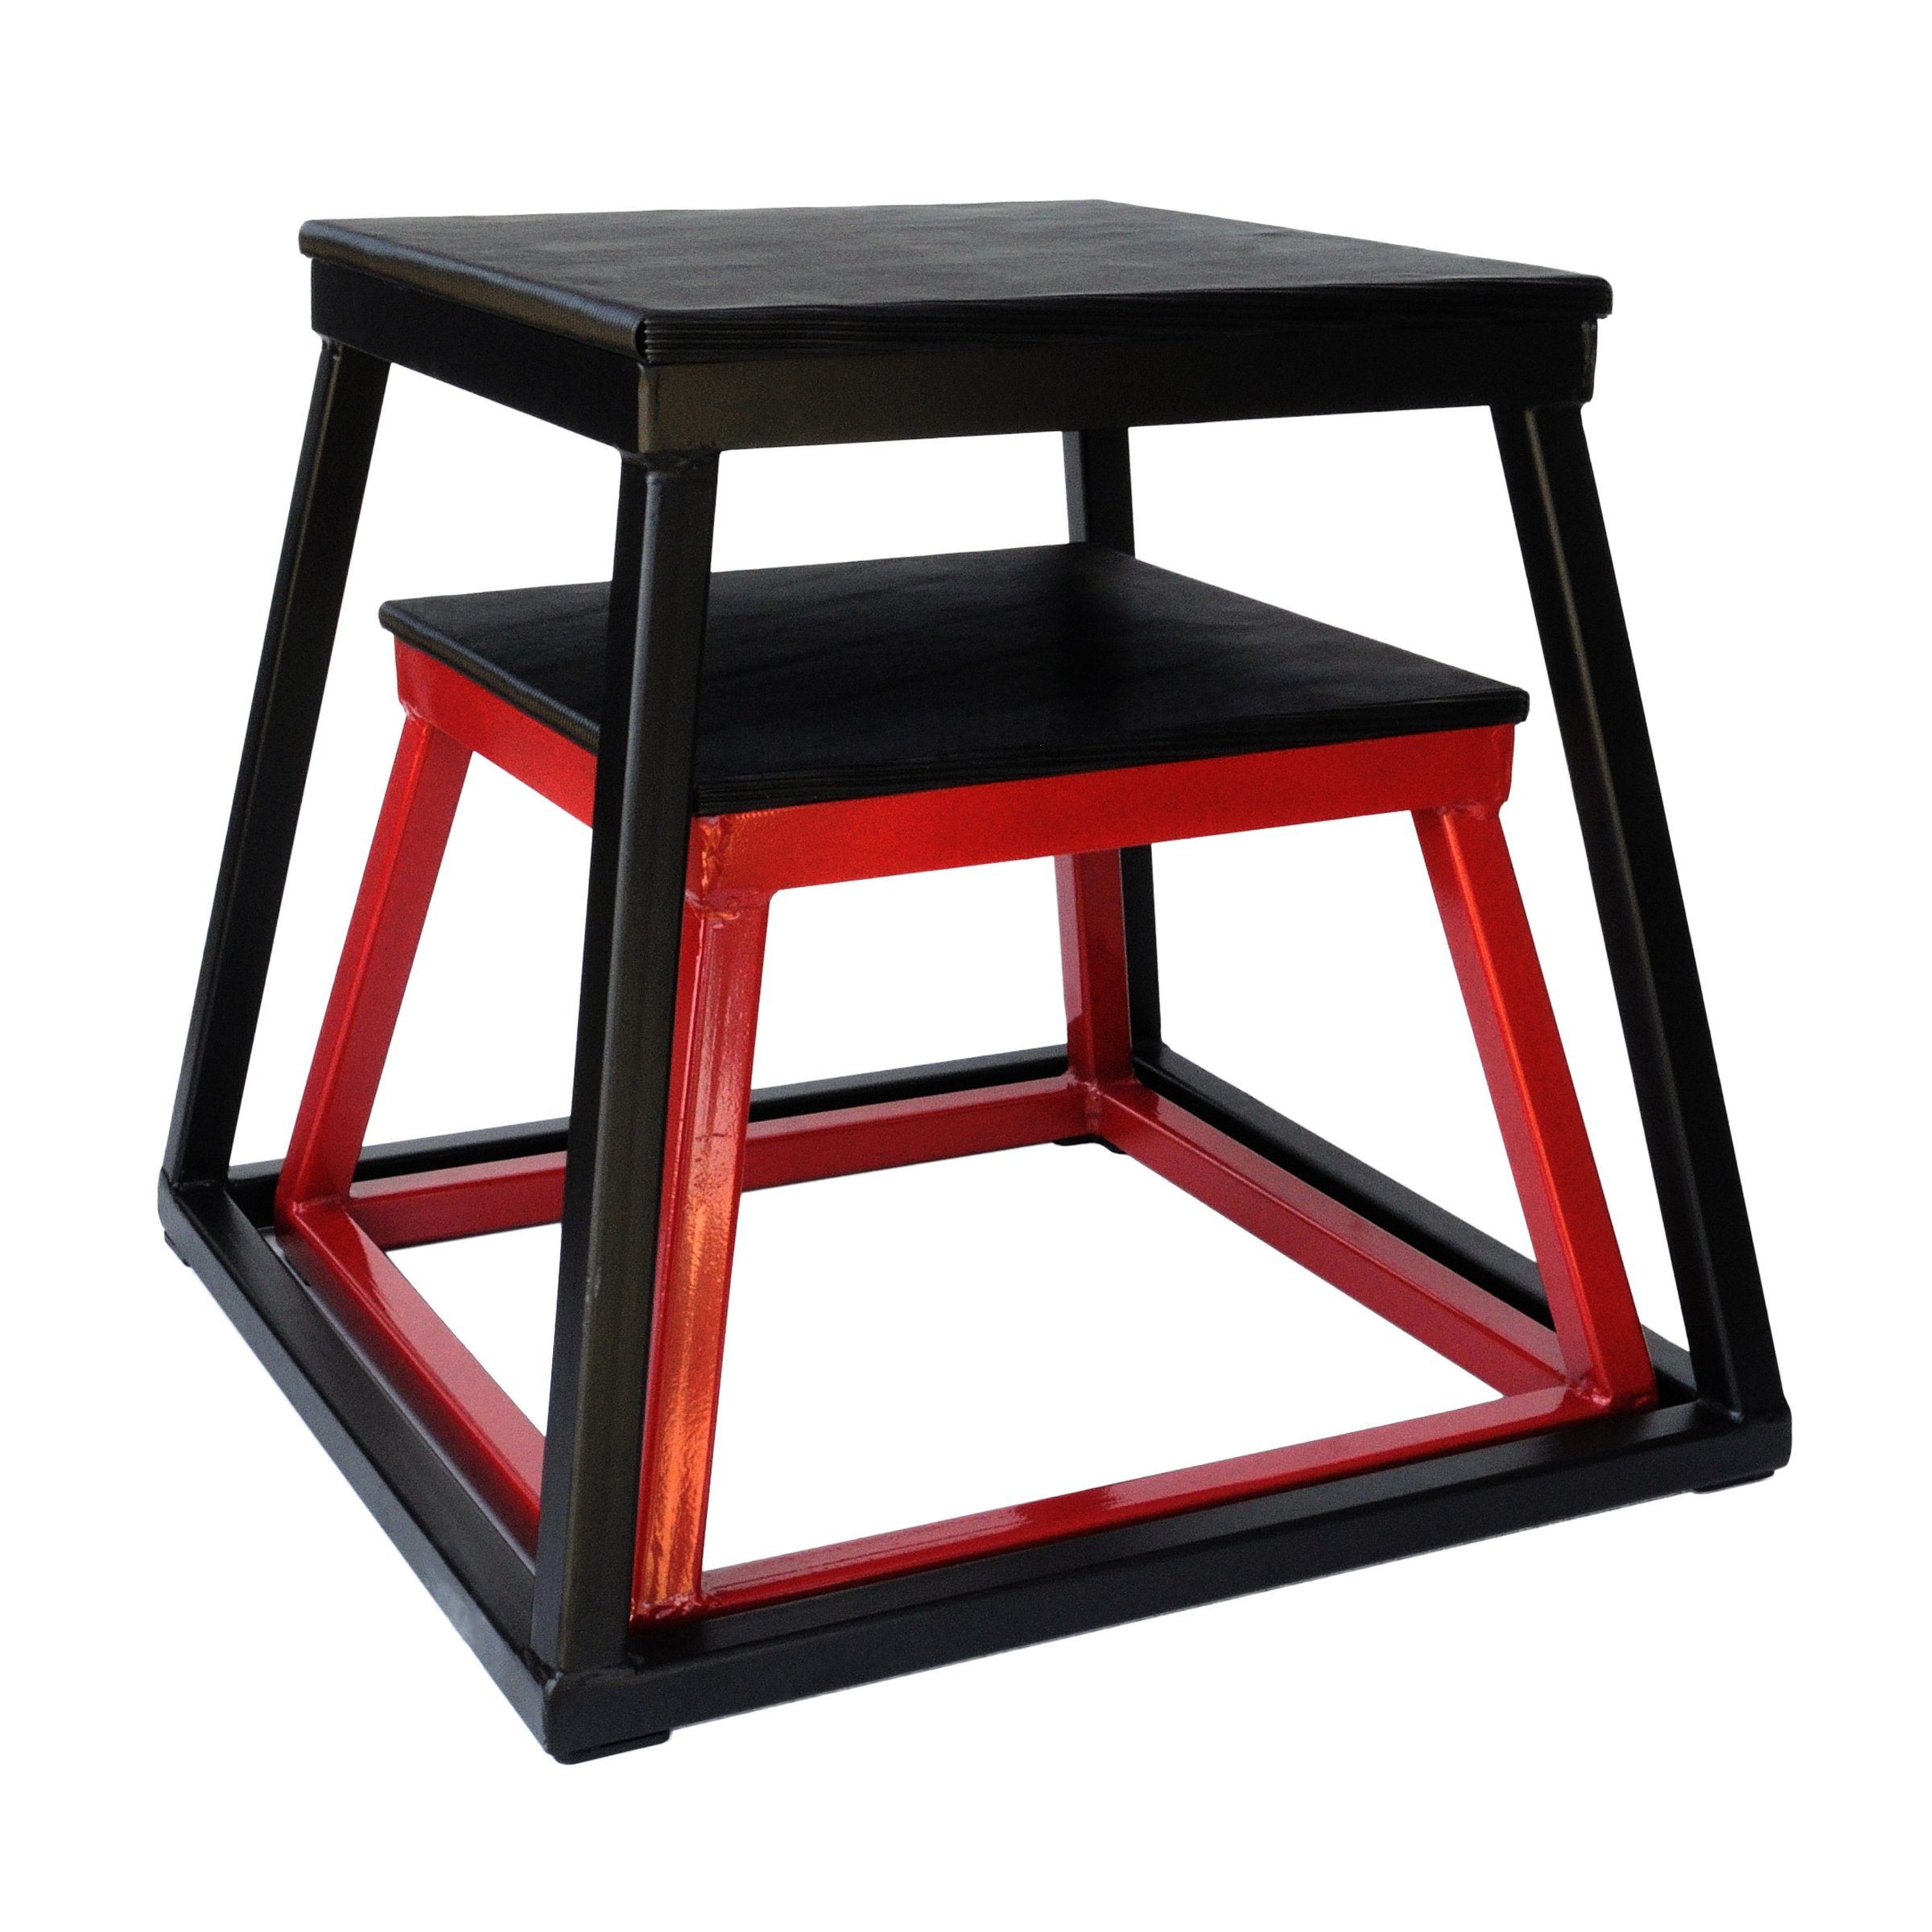 Ader 12'', 18'' Plyo Boxes (Red + Black)